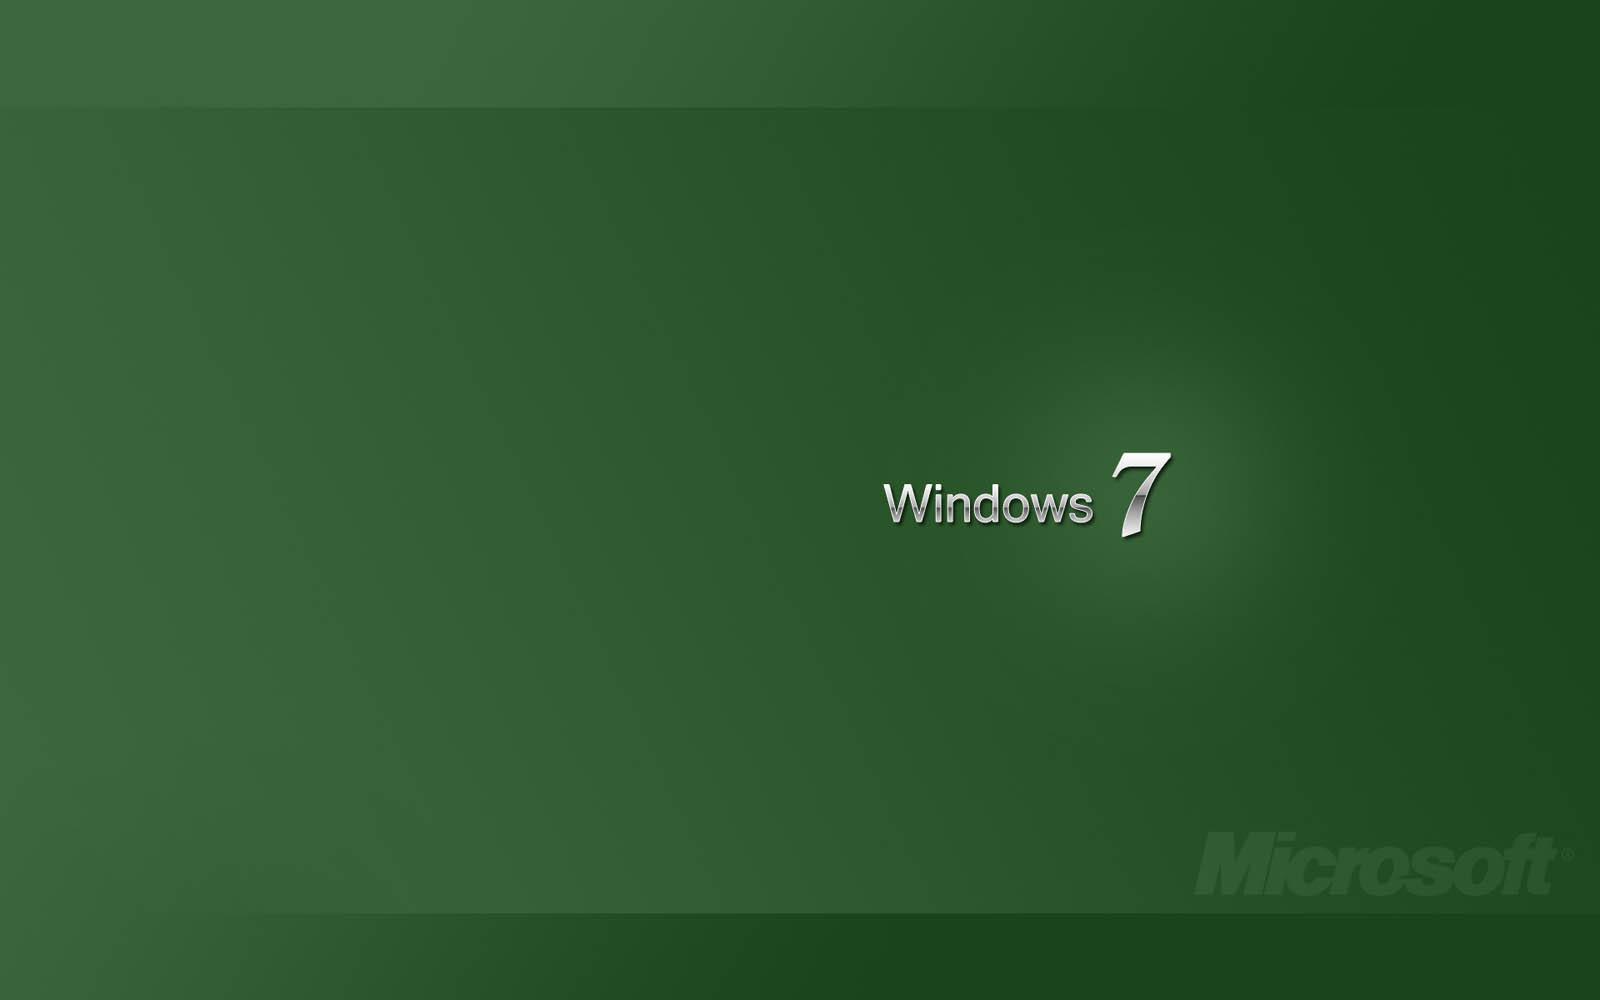 XS Wallpapers HD: Green Windows 7 Wallpapers